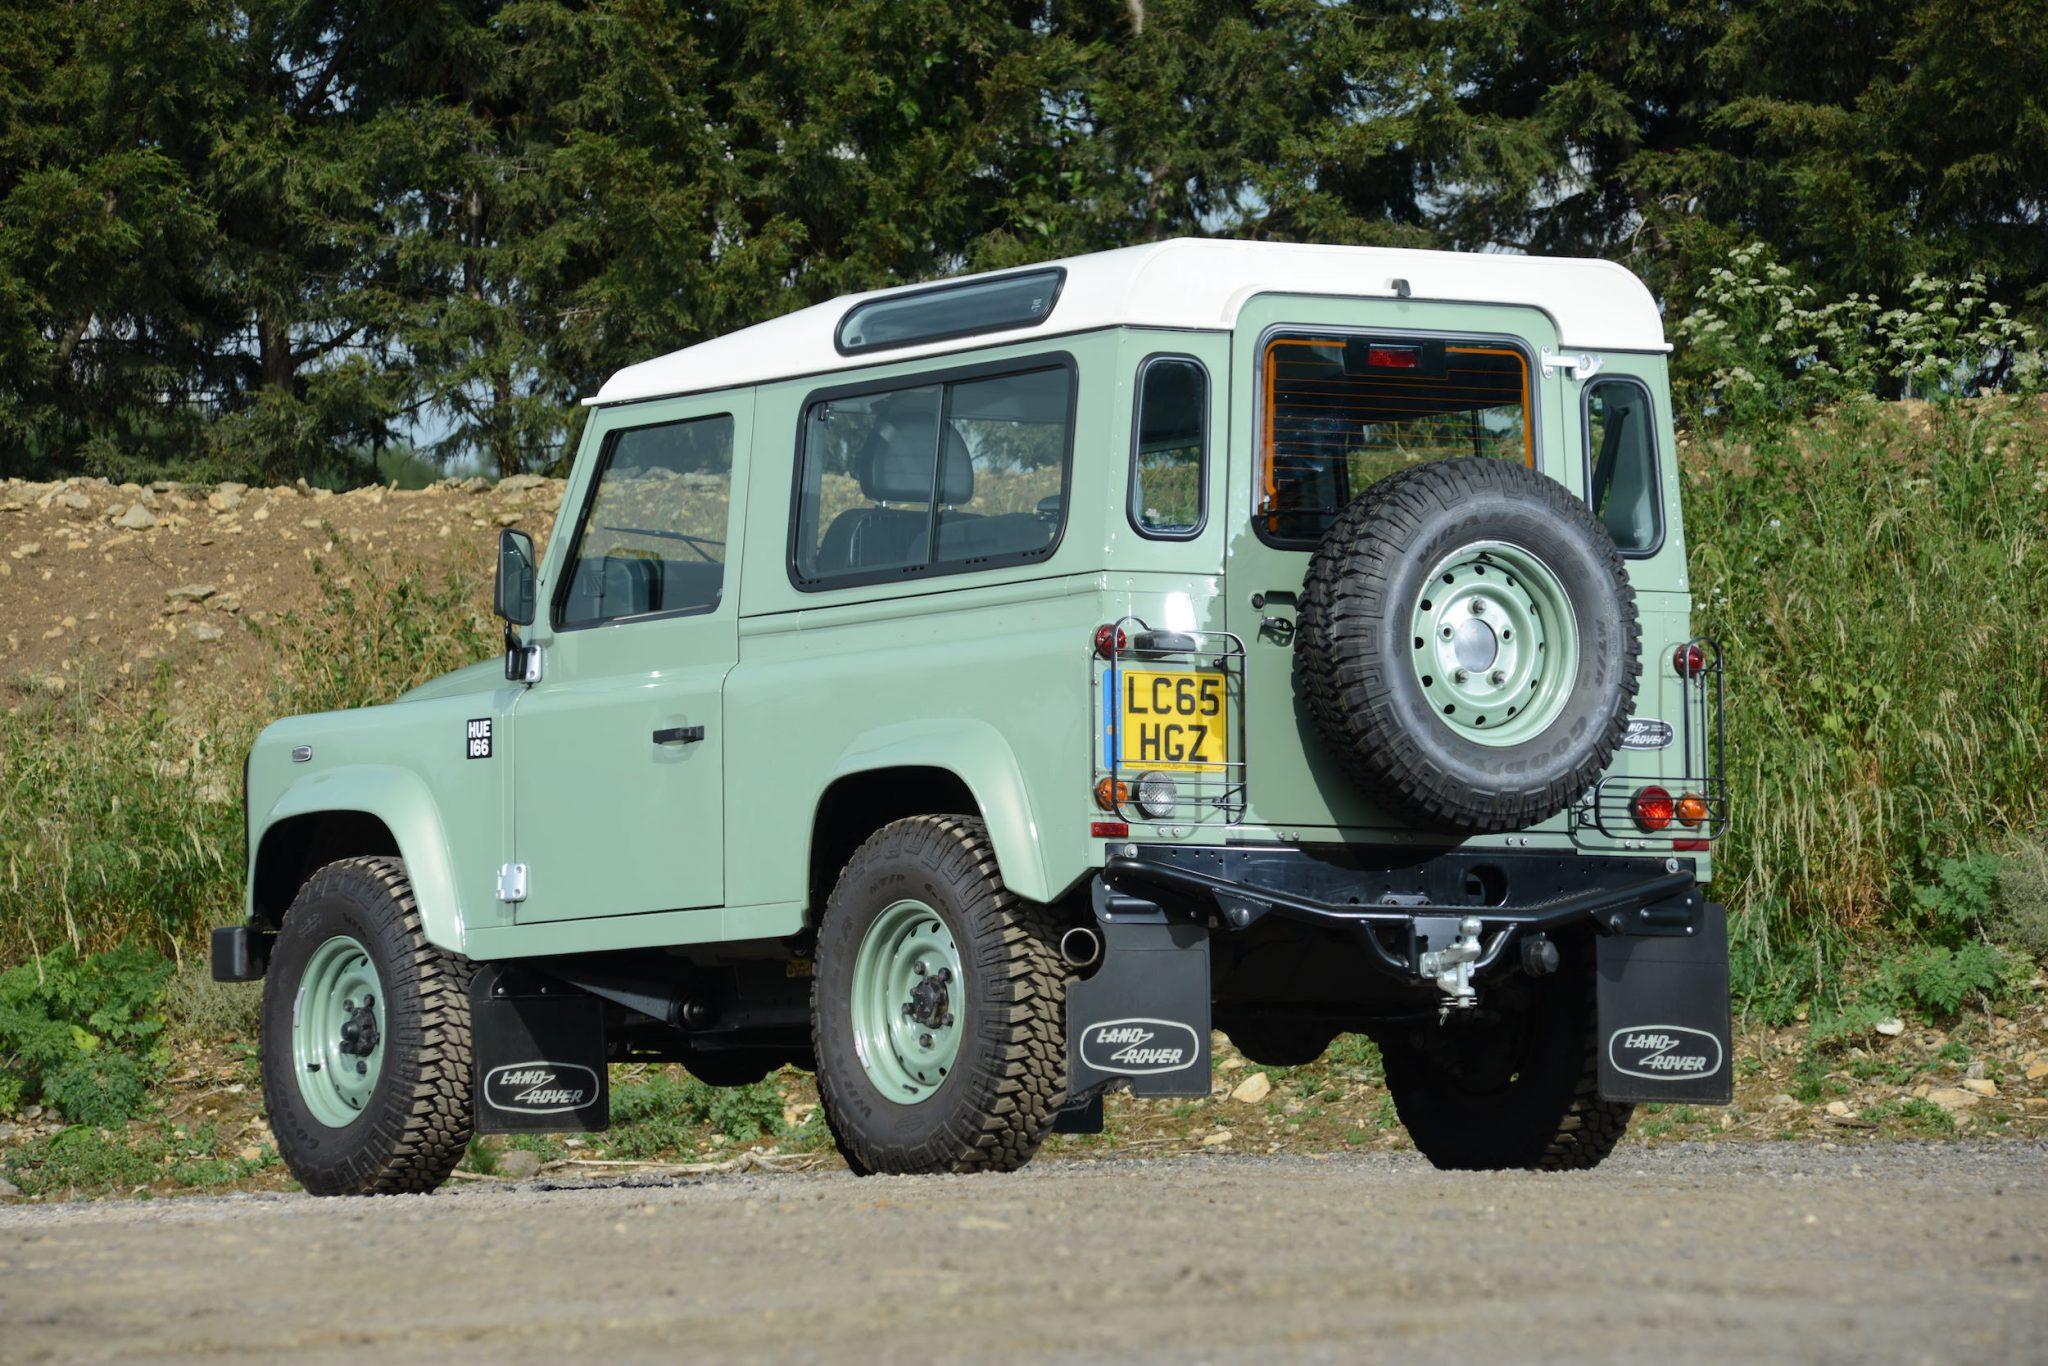 Rowan Atkinson's Land Rover Defender 12 - Rowan Atkinson's Land Rover Defender